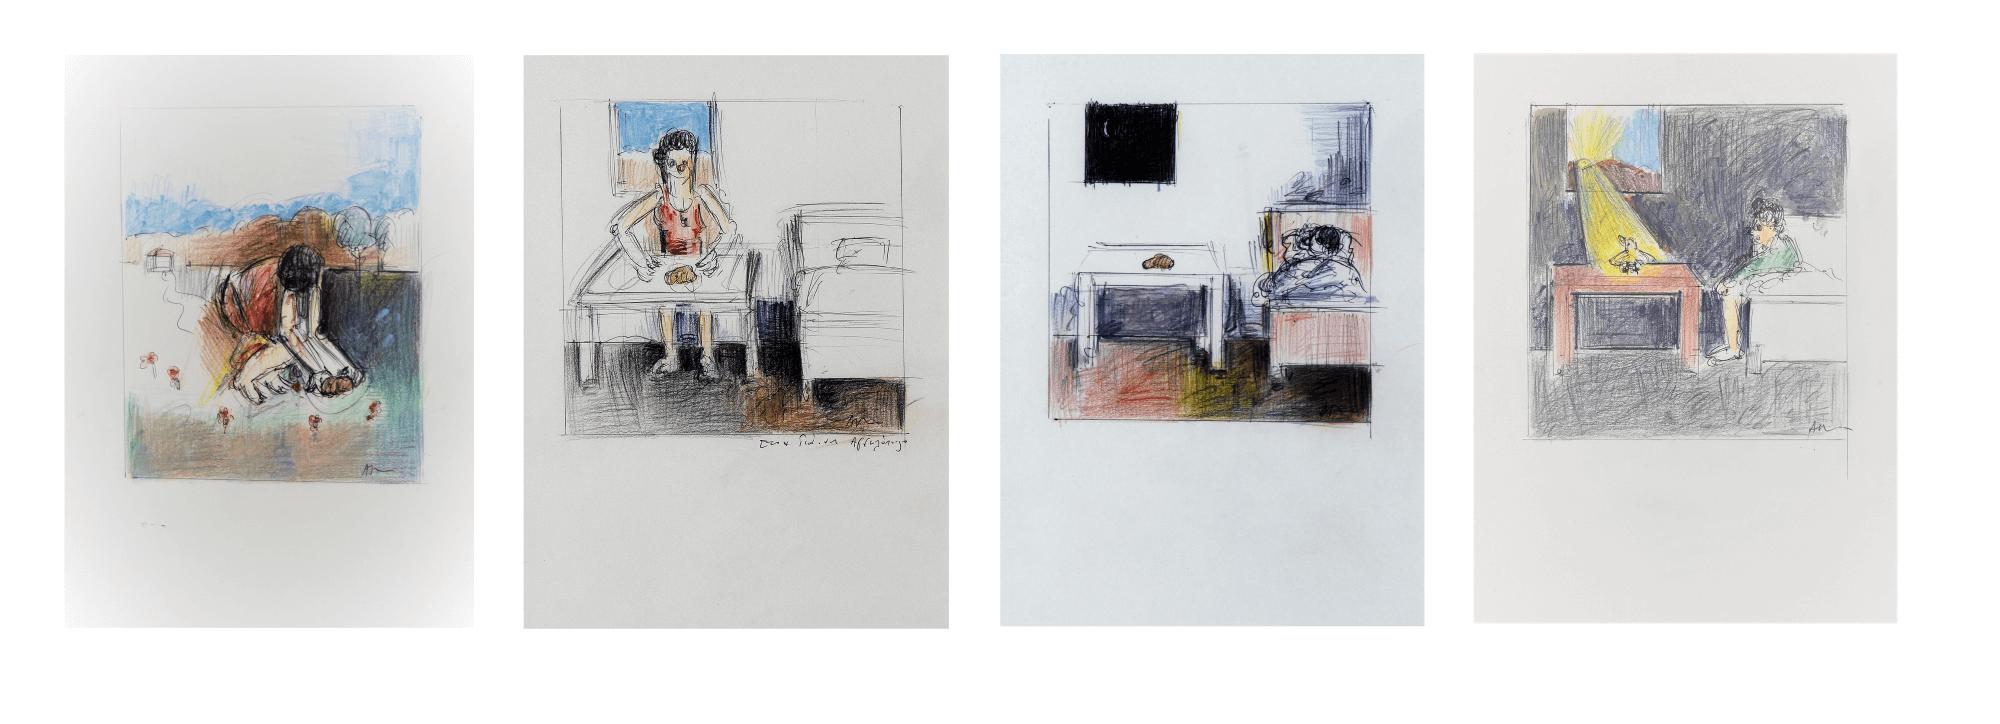 "Apostolos Georgiou (b.1952) ""One story"", Circa 2000 Drawings, colored pencils and ink on paper (A) 17 x 14 cm (B) 16 x 16 cm (C) 15 x 15 cm (D) 16 x 15 cm"